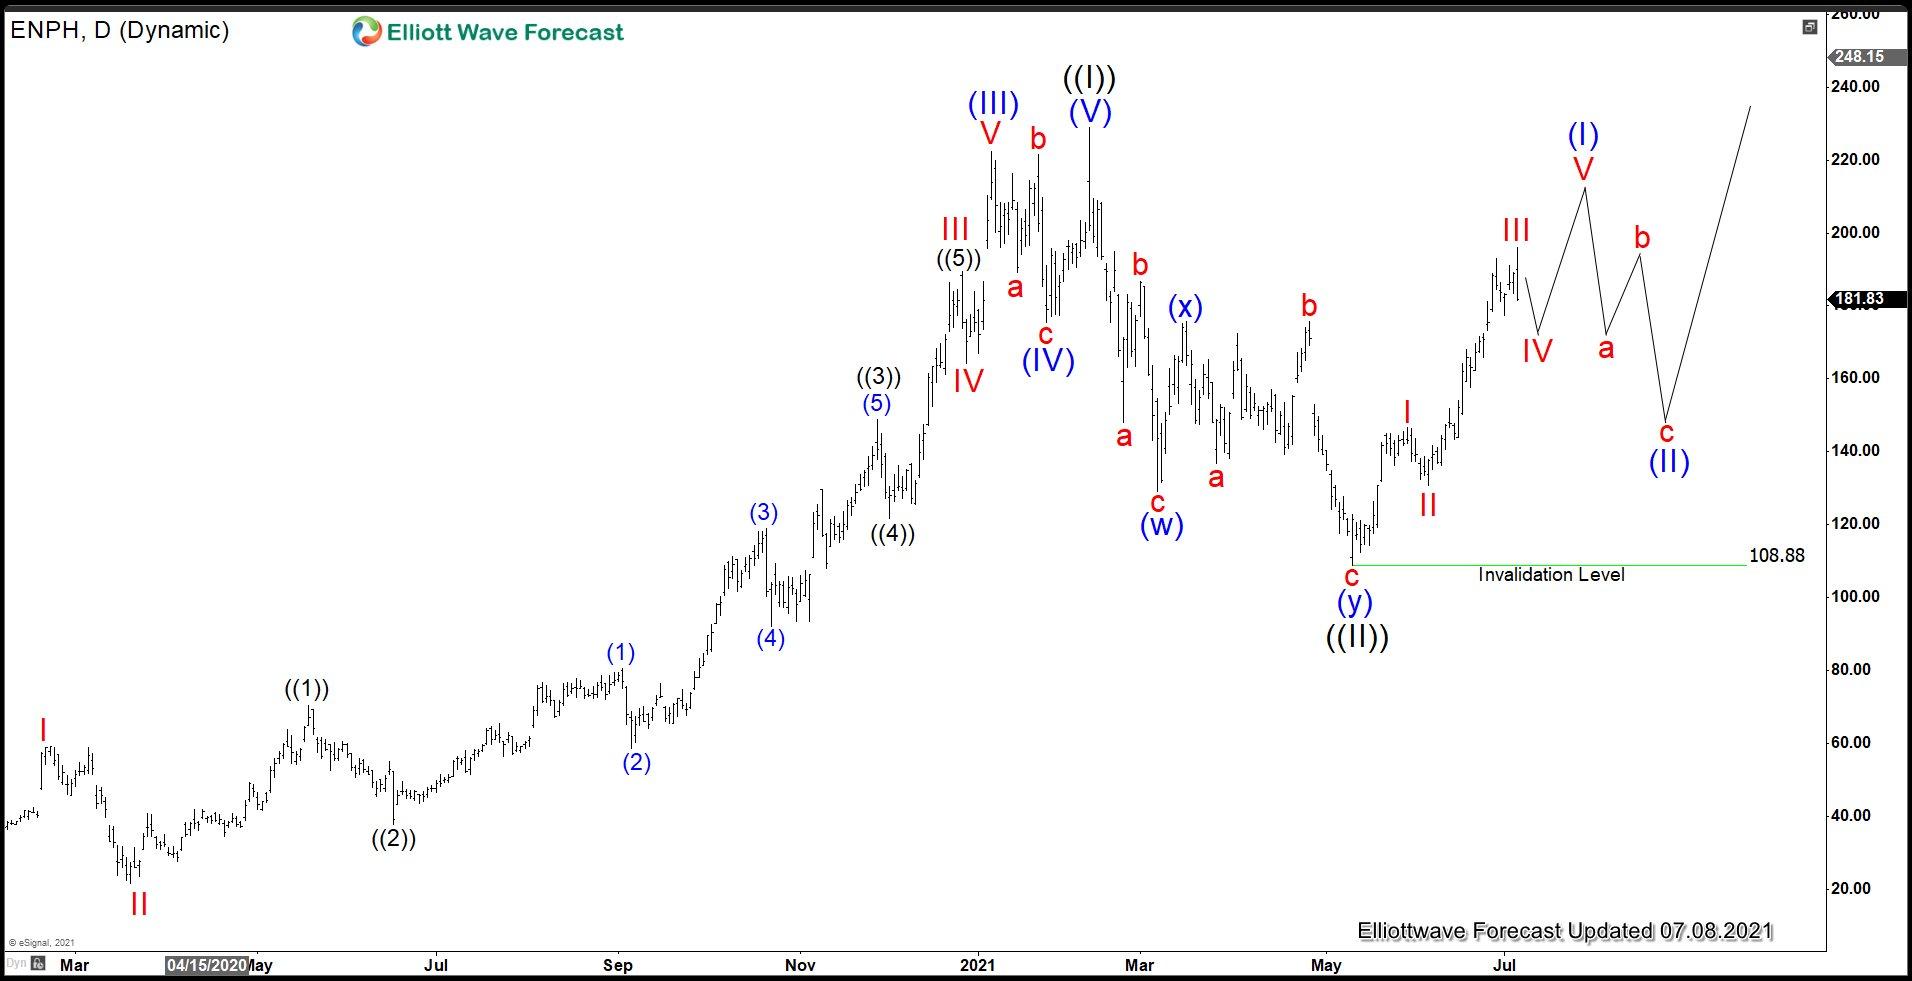 Enphase Energy (ENPH) Elliott Wave Chart